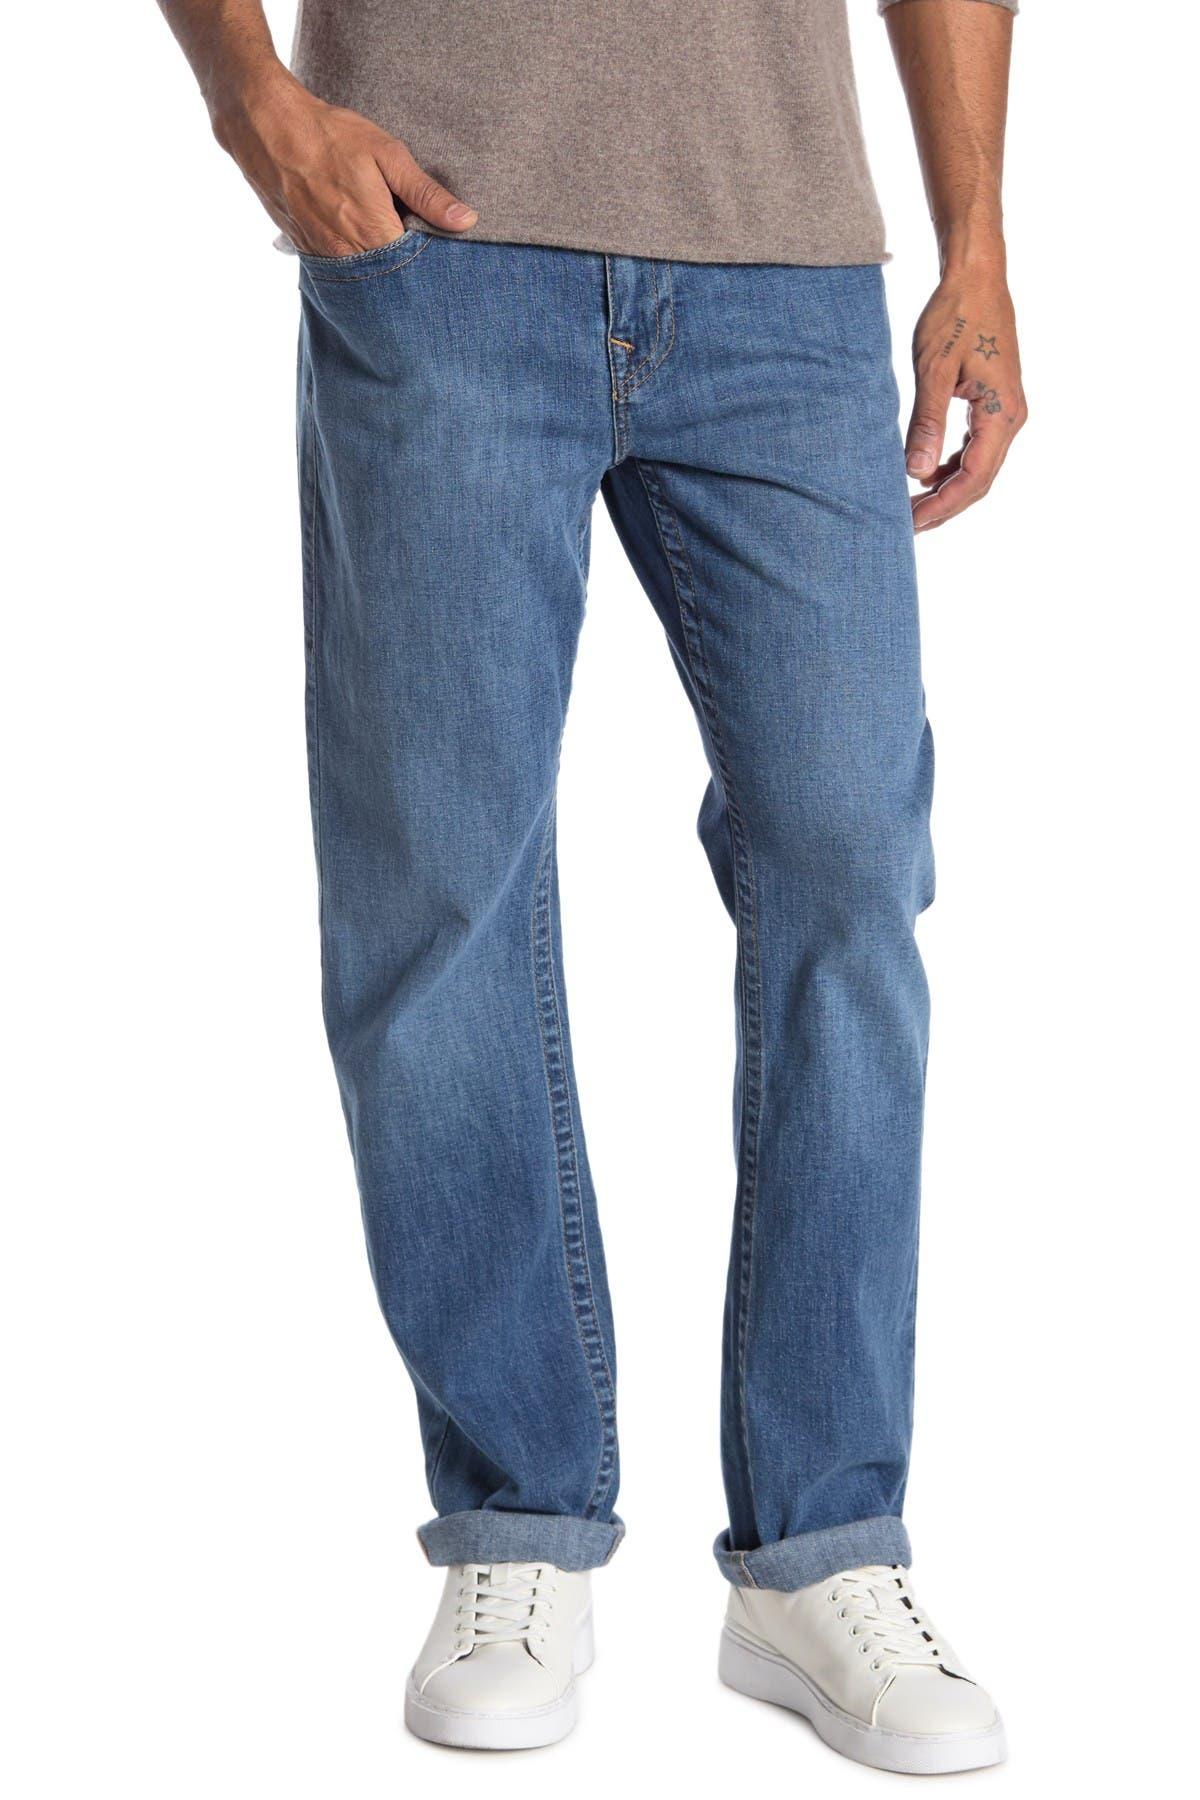 Image of True Religion Ricky Straight Leg Jeans